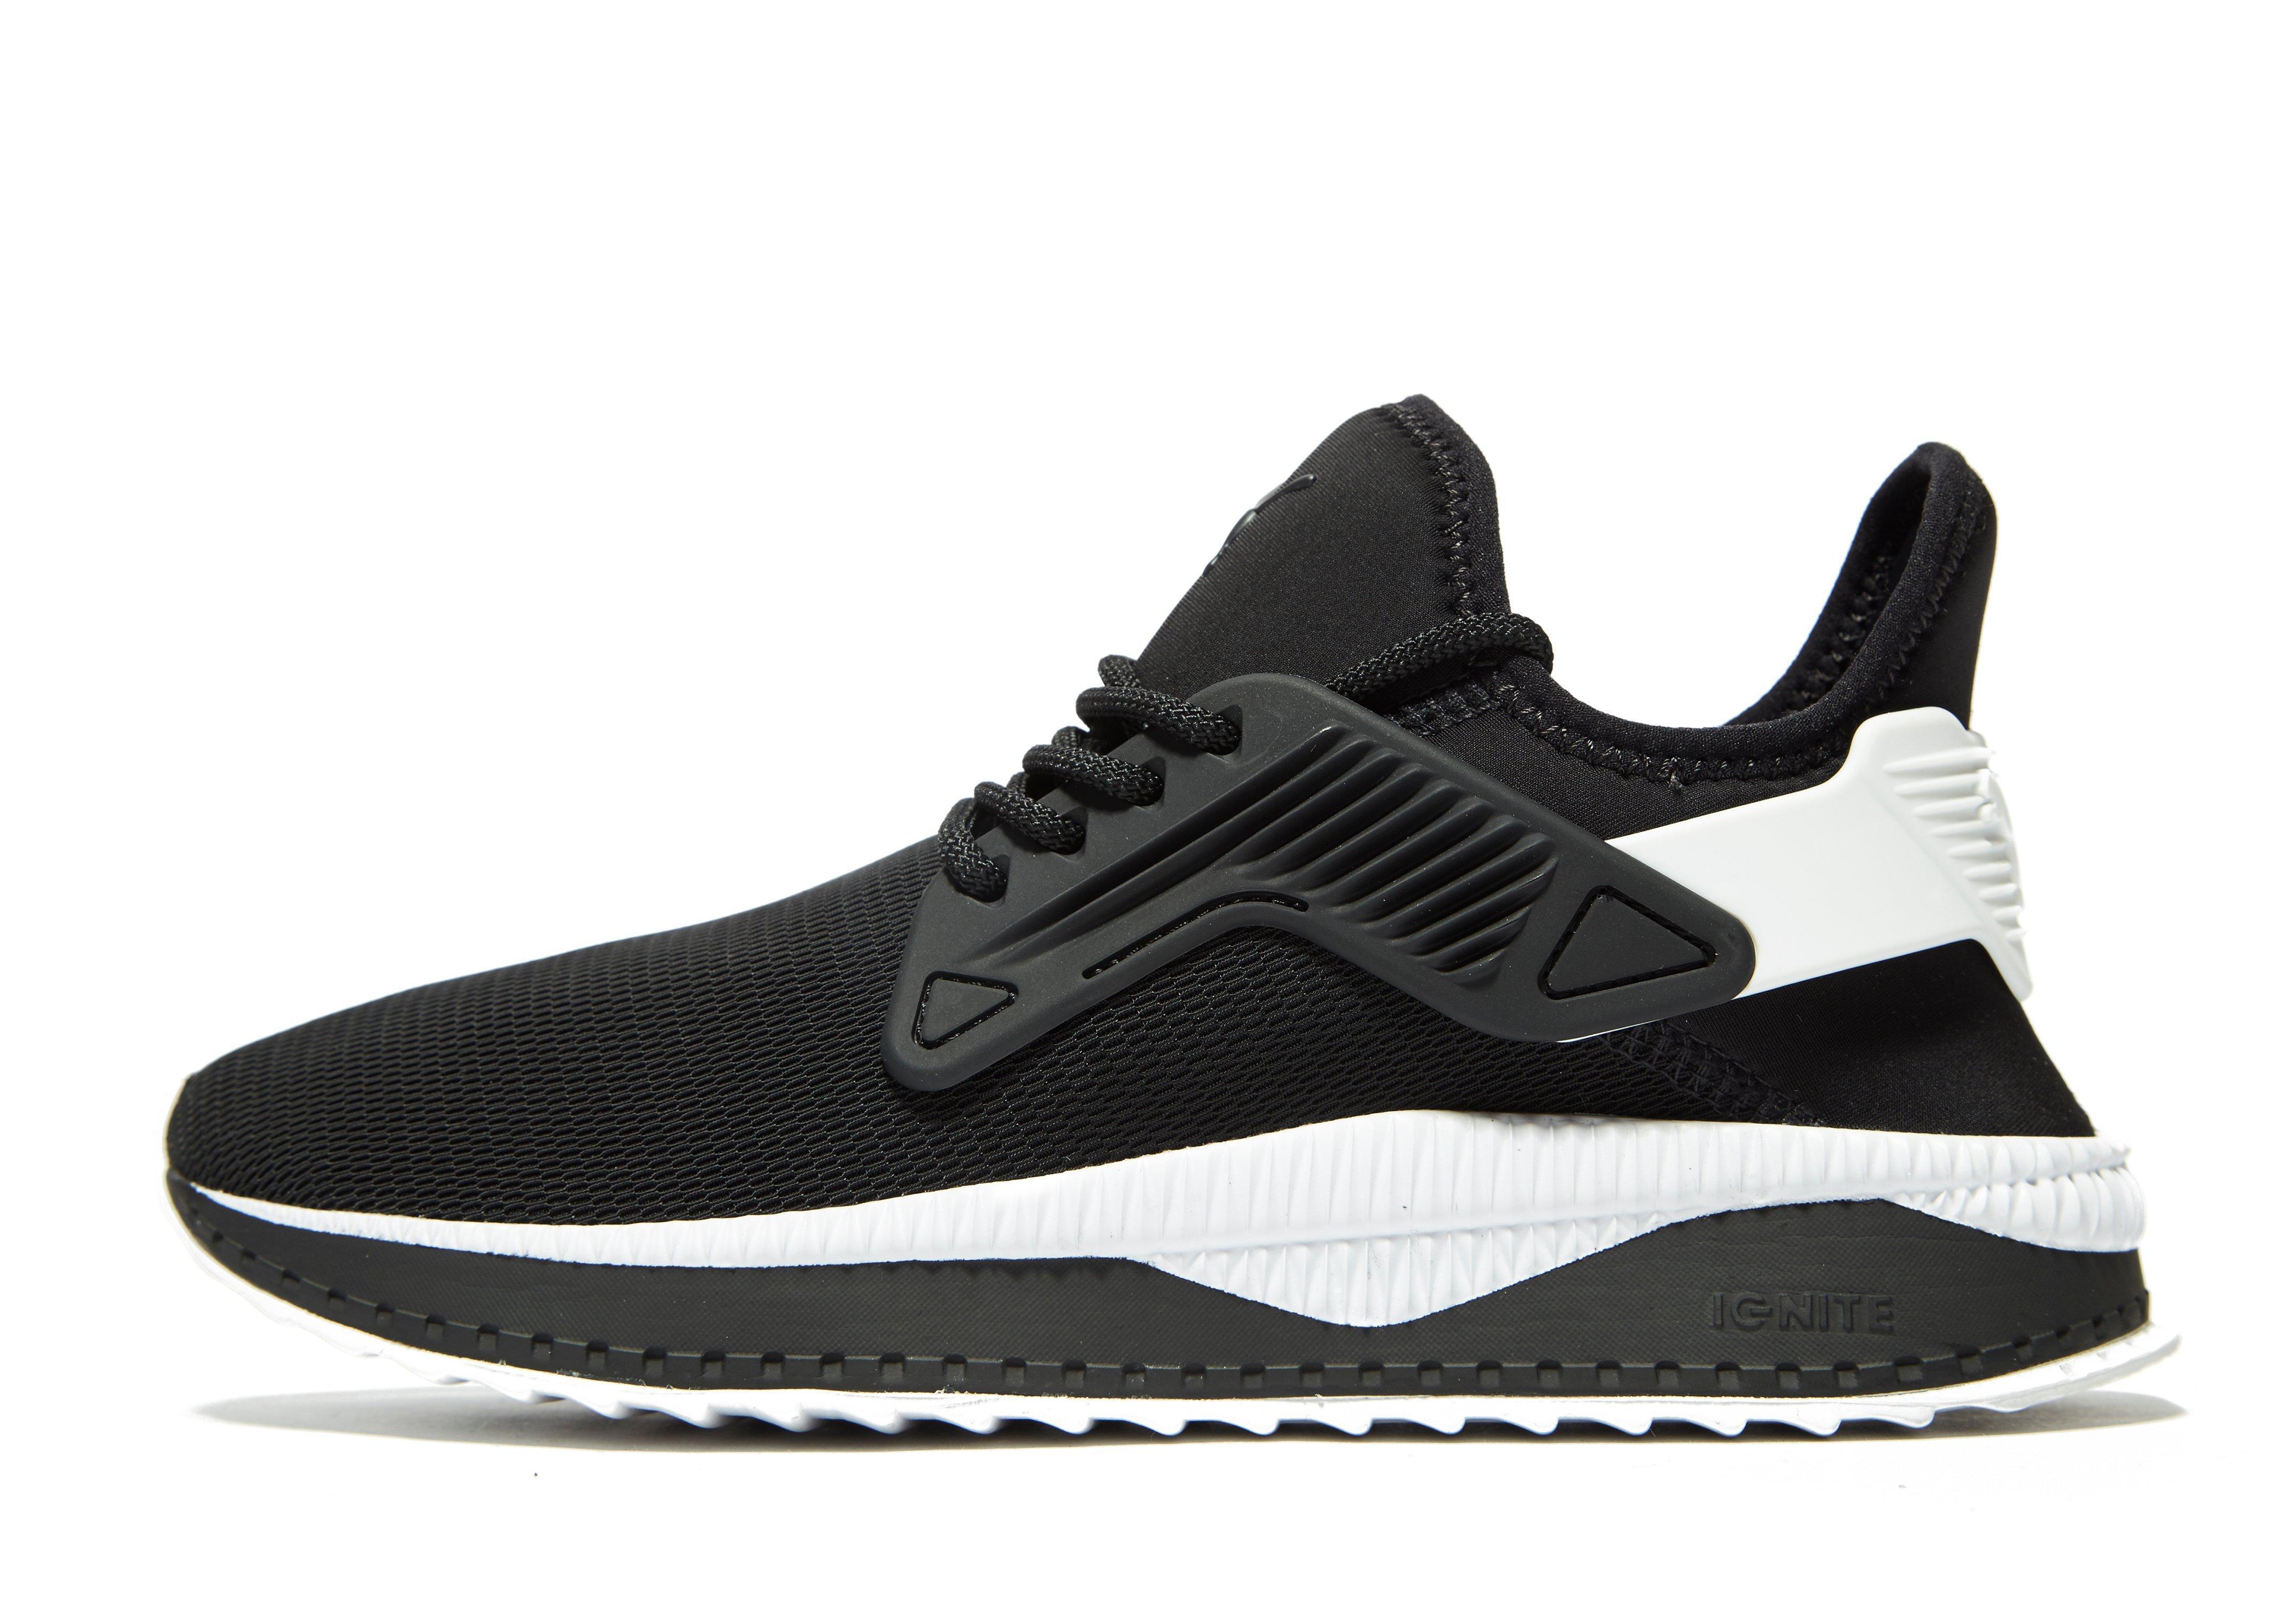 Puma Tsugi Cage 365962 03 Best shoes SneakerStudio